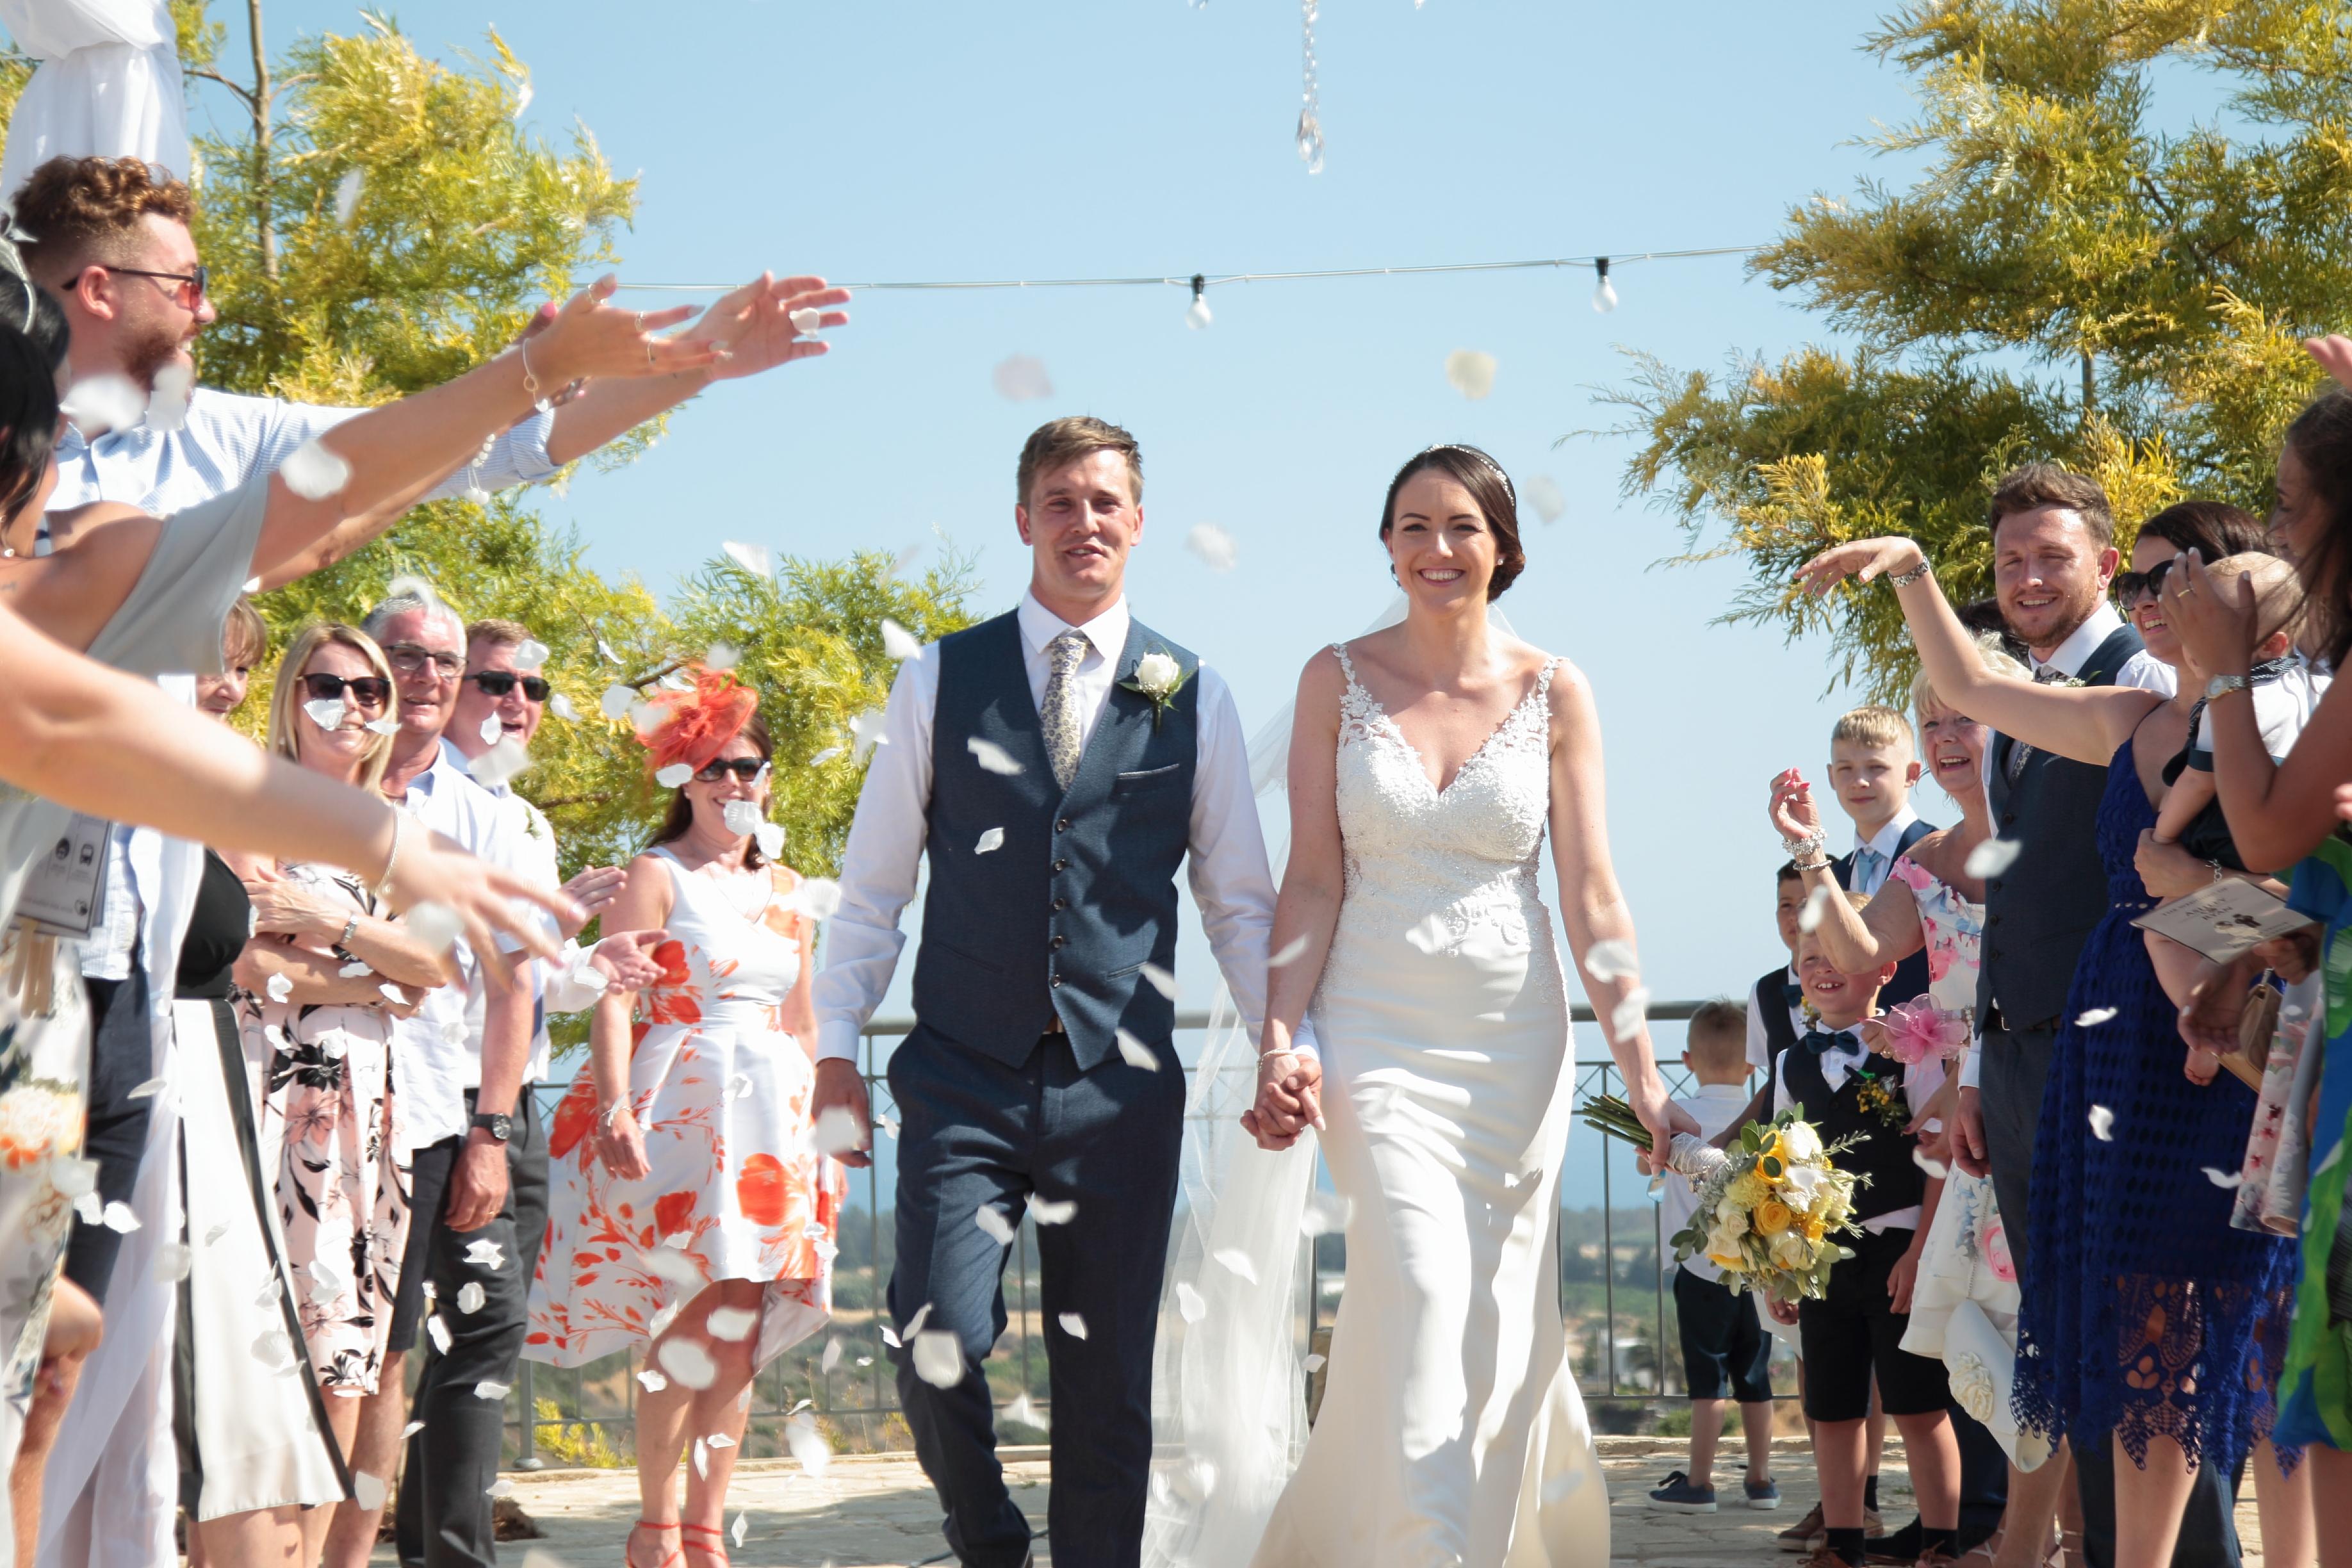 Liopetro wedding venue Paphos Cyprus